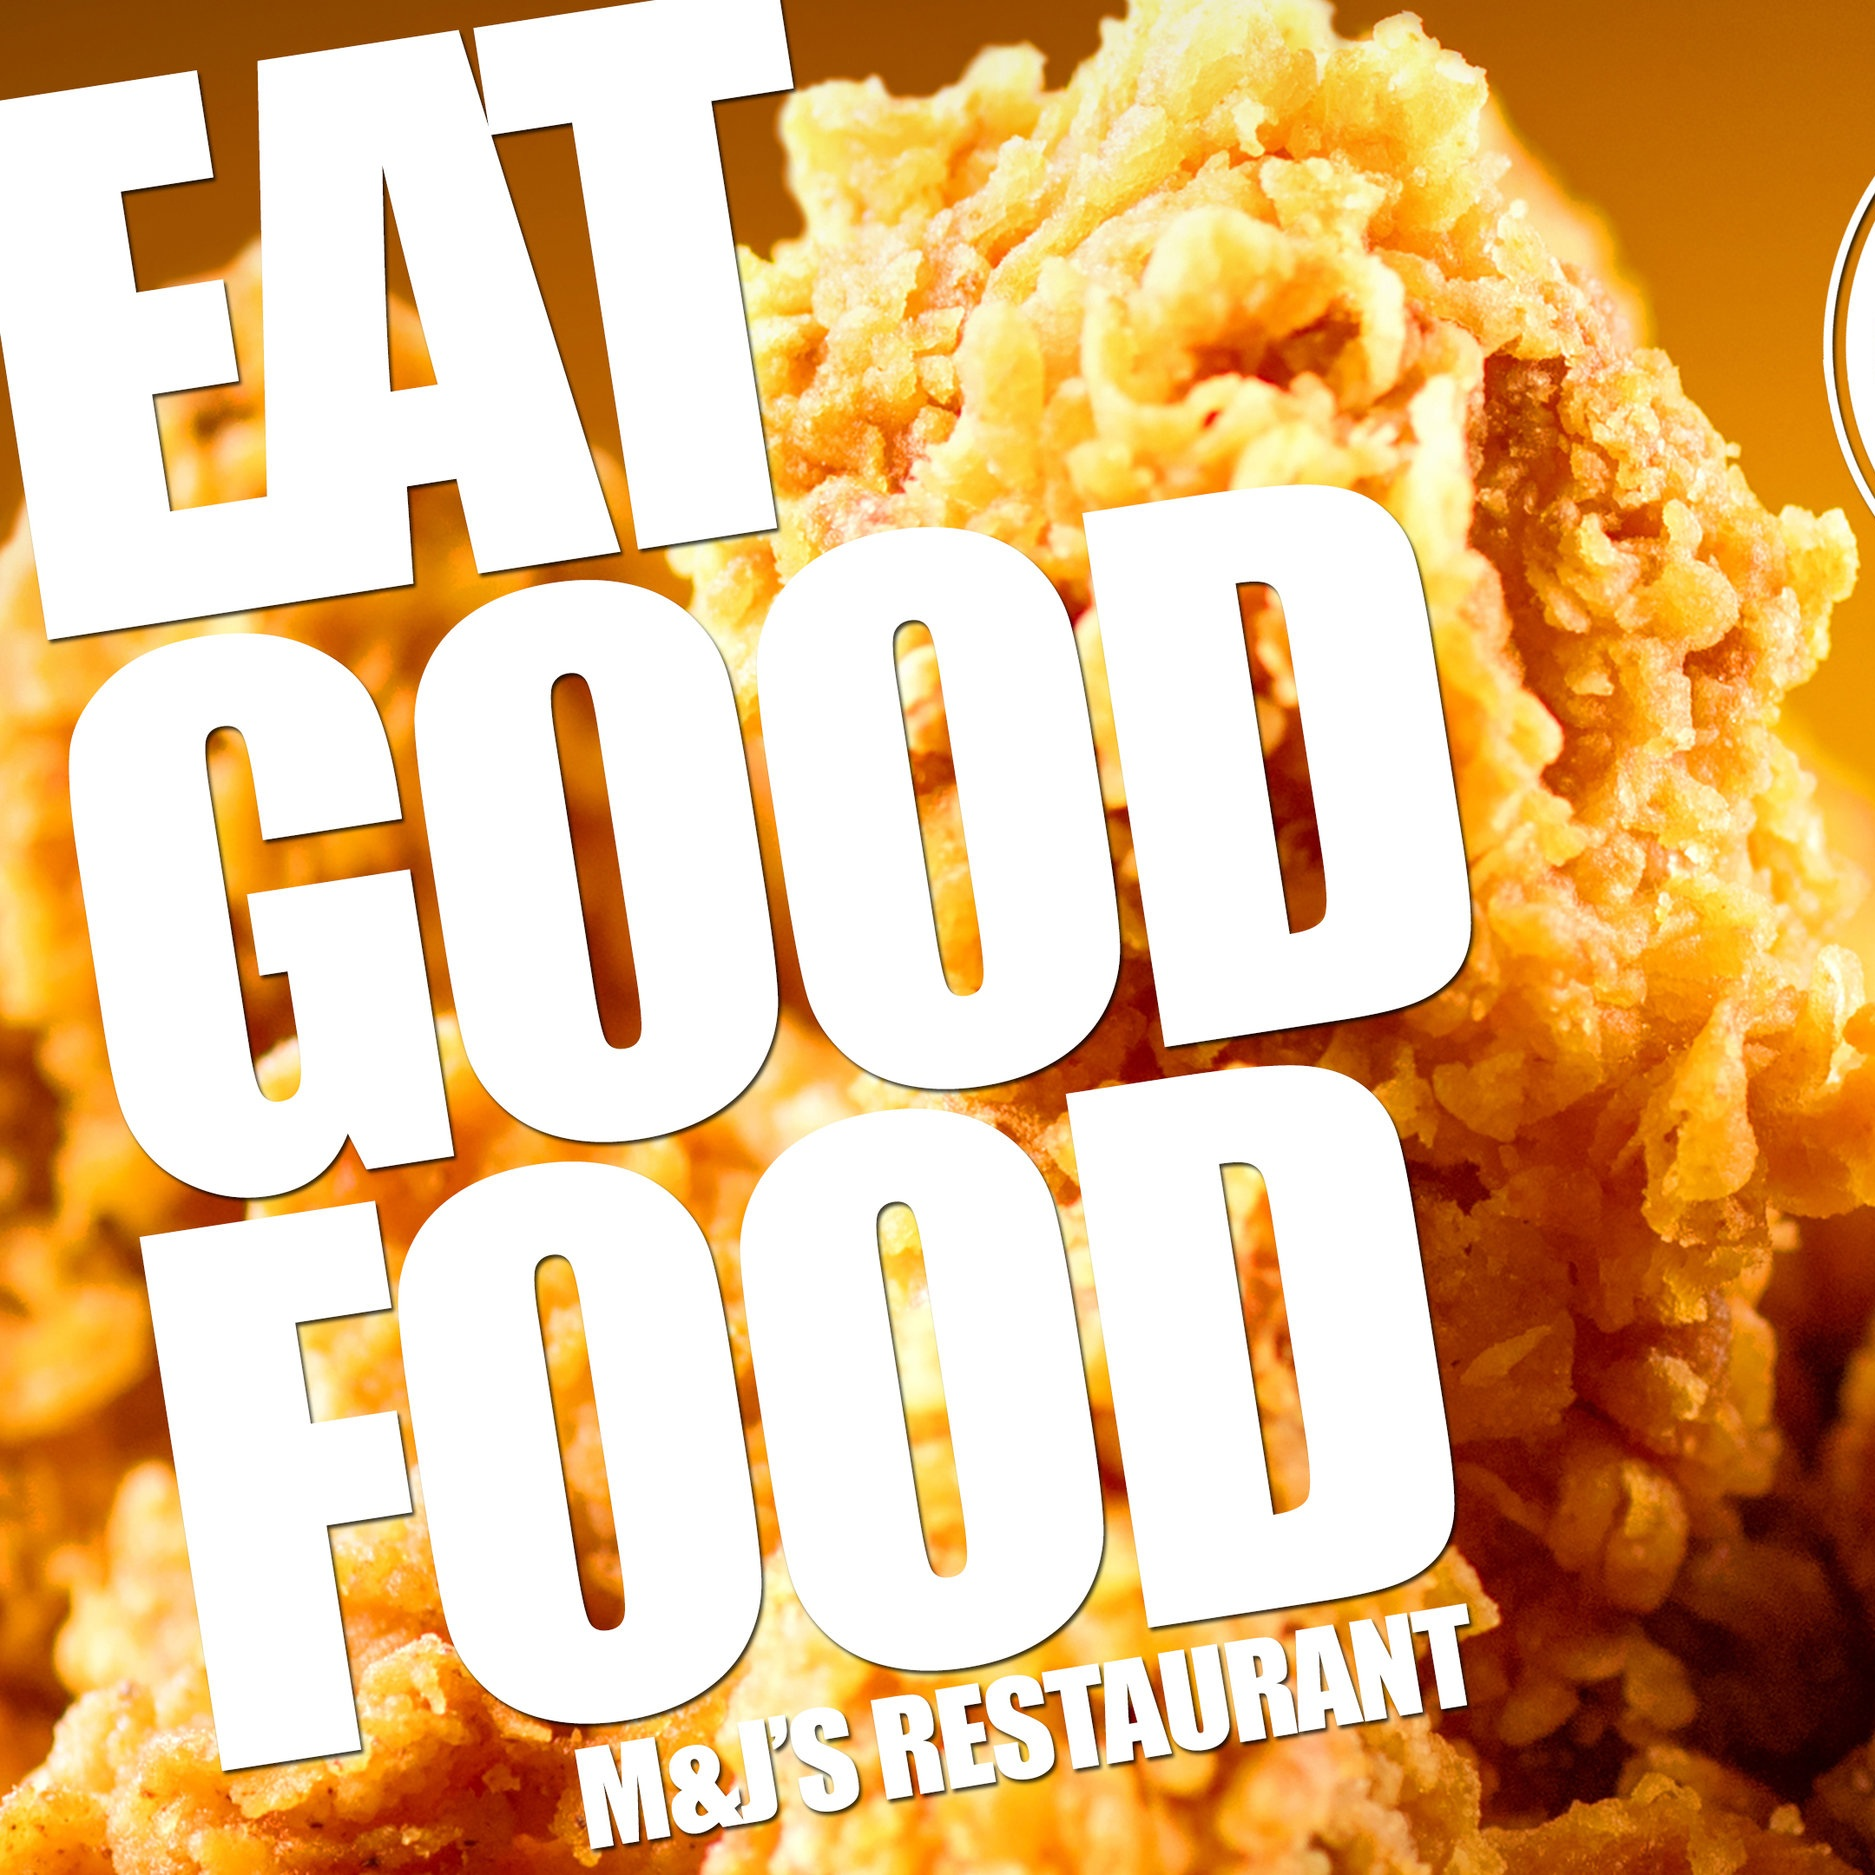 30x40_SQUARE_MAIN-WALLS_EAT-GOOD.jpg